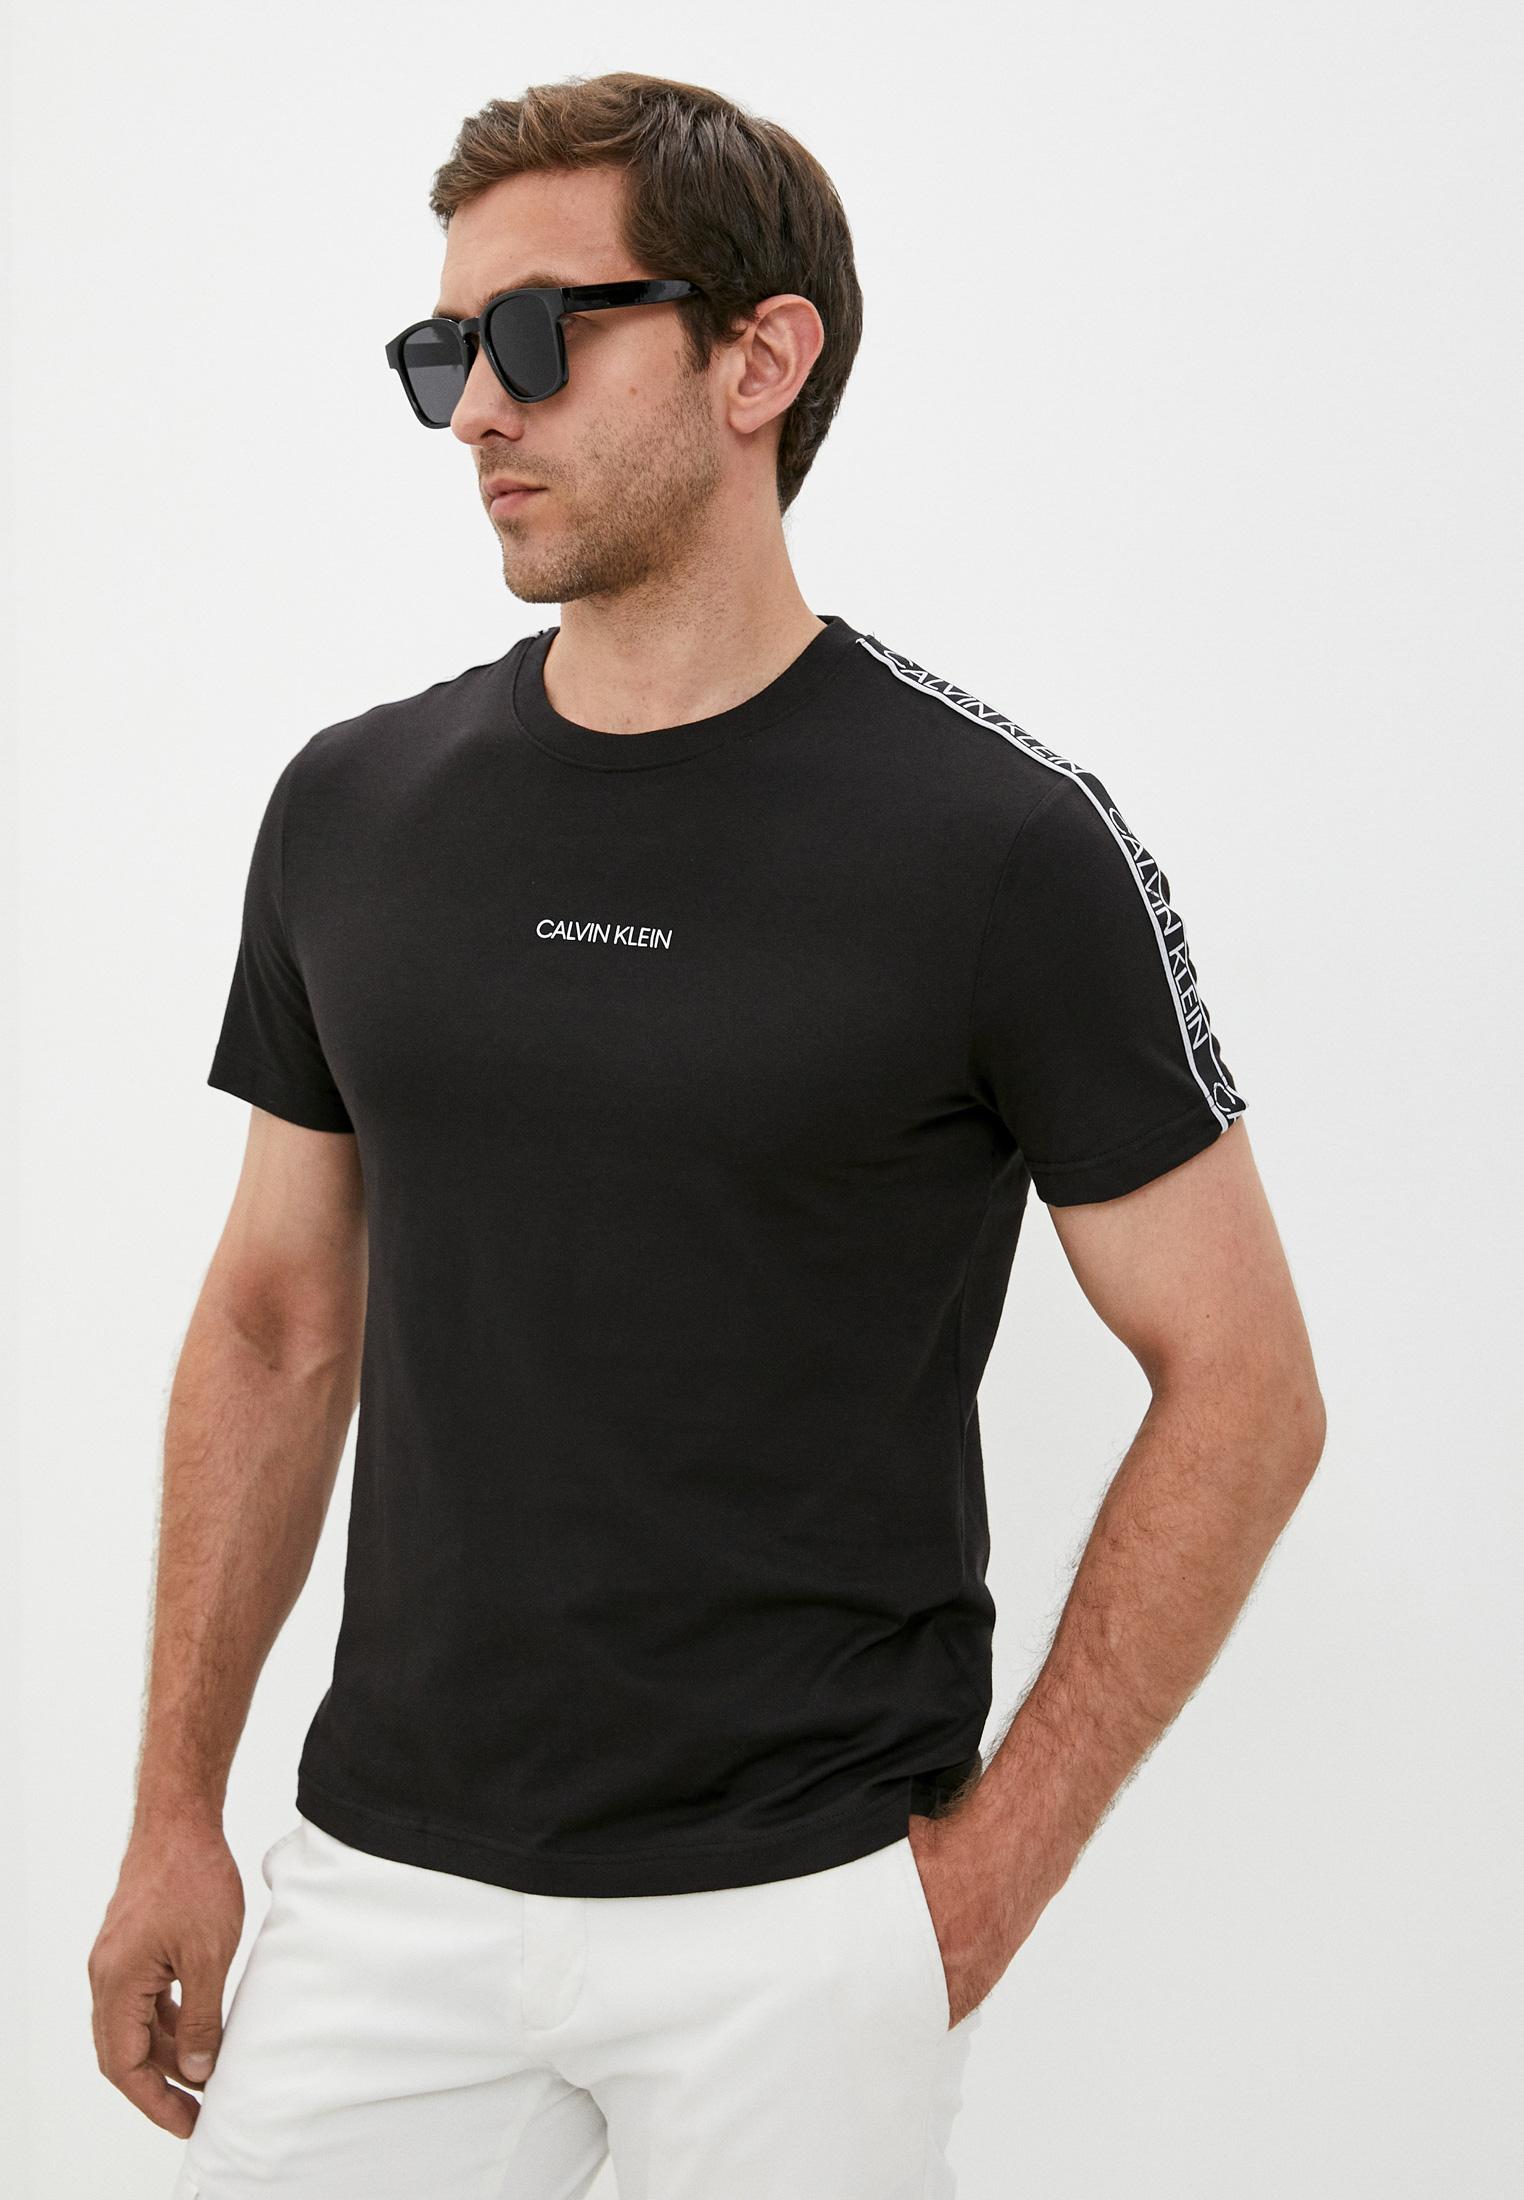 Мужская футболка Calvin Klein (Кельвин Кляйн) K10K107312